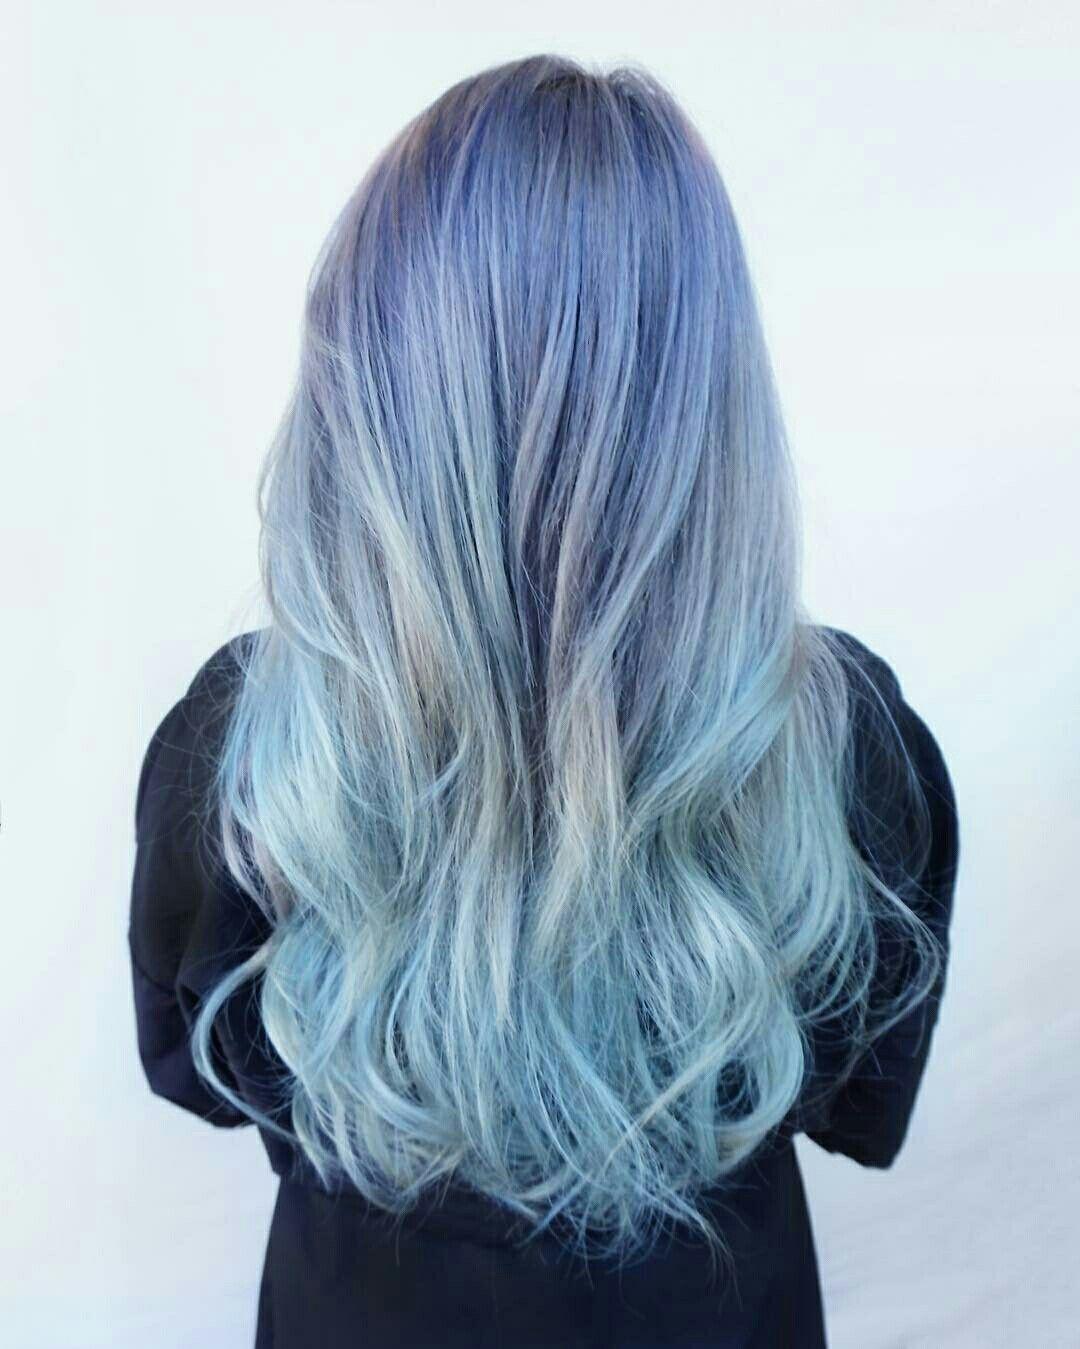 Pin By Szu K K On Hair Pinterest Hair Coloring Dye Hair And